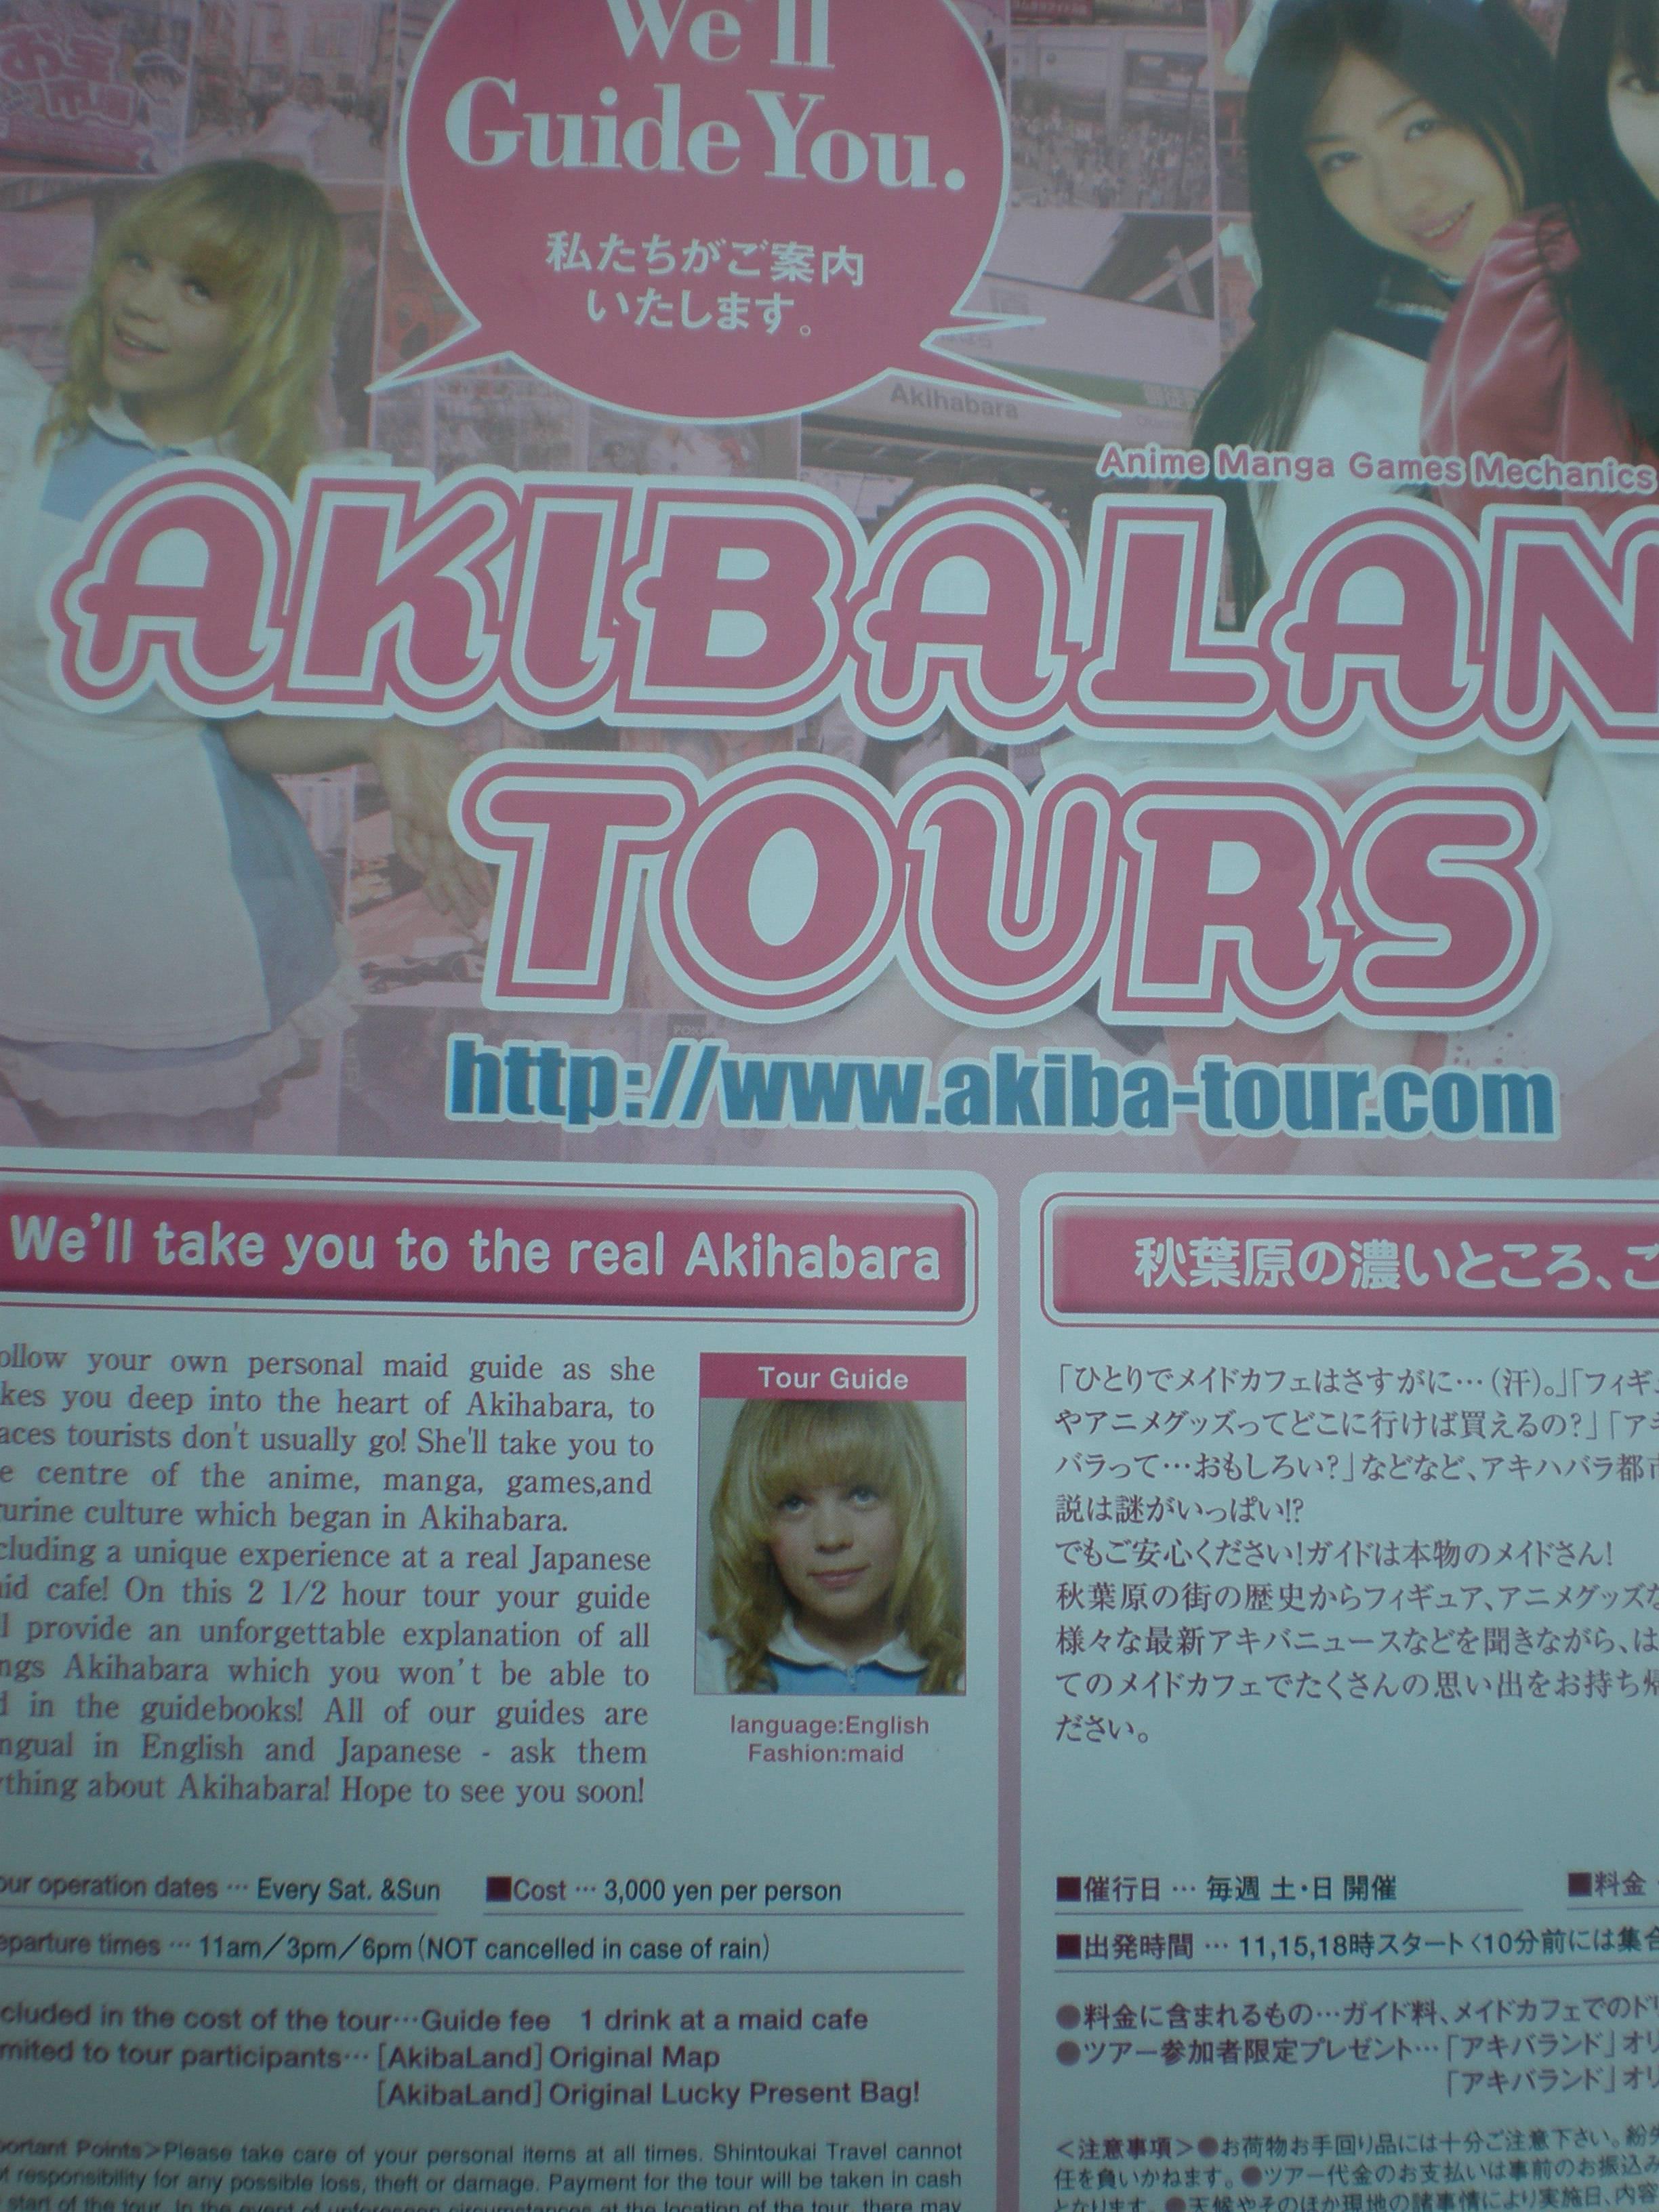 Akihabara tour poster